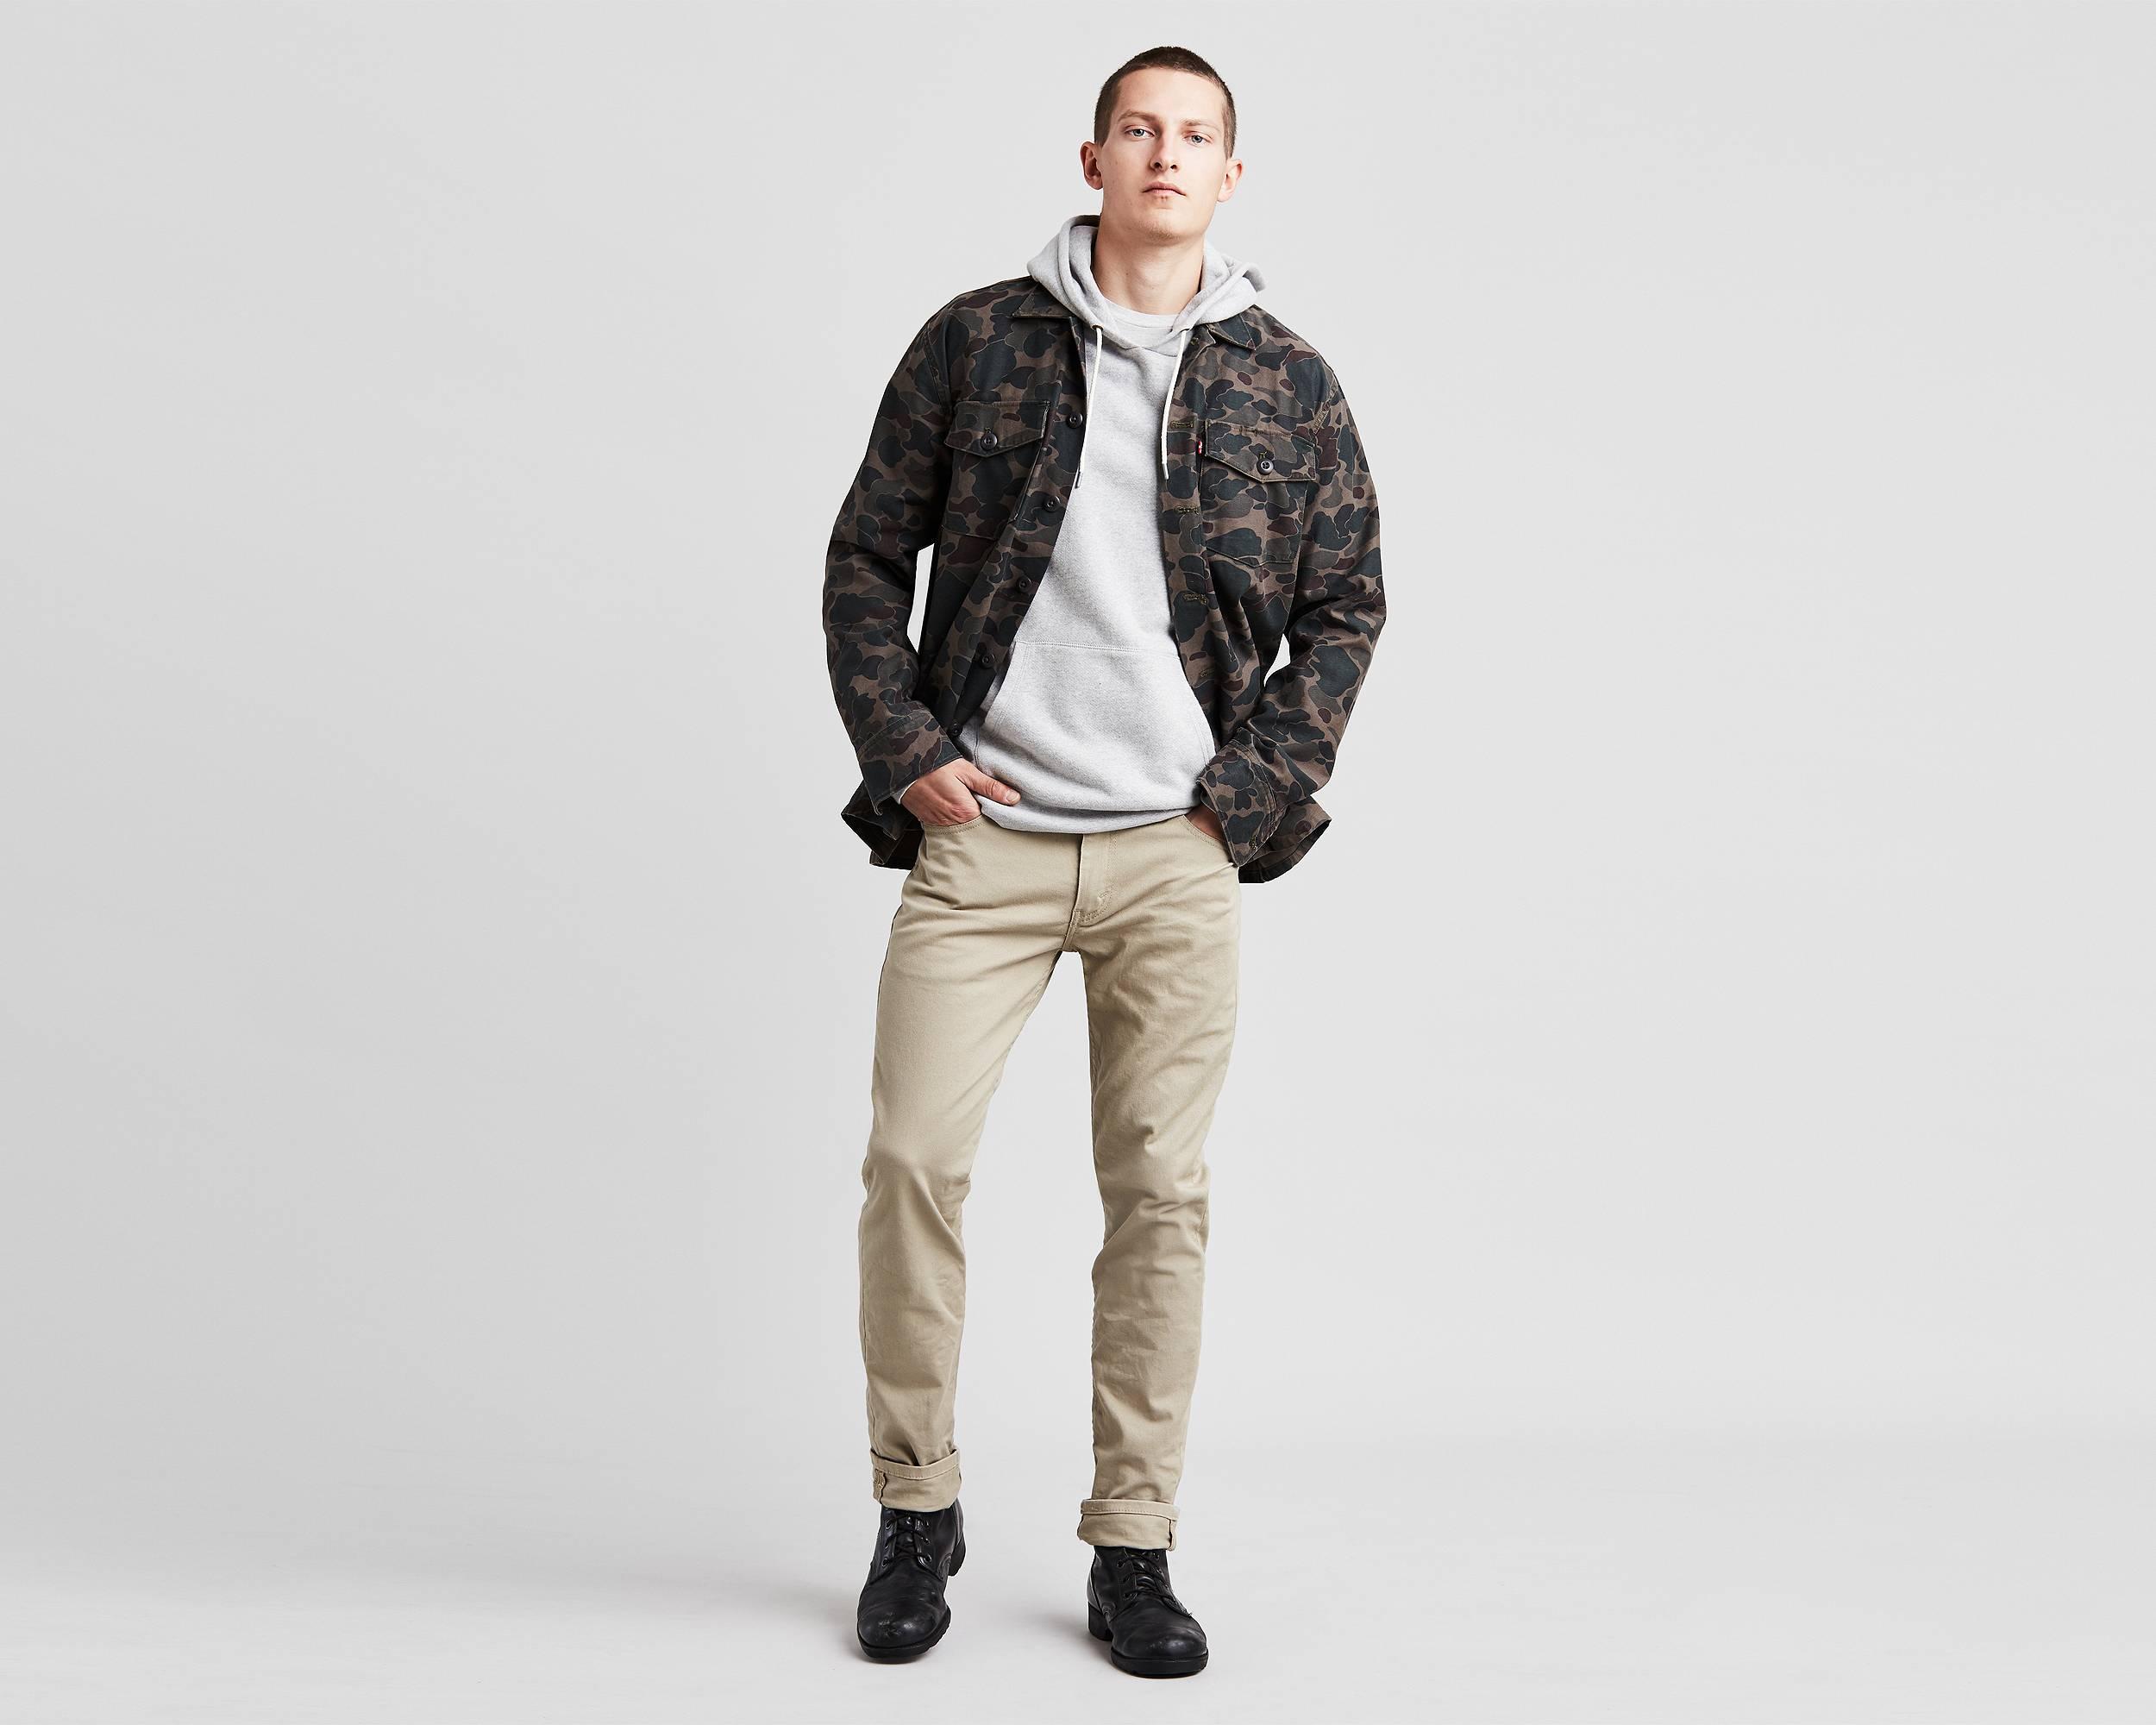 Slim Jeans - Shop Slim Jeans for Men | Levi's®